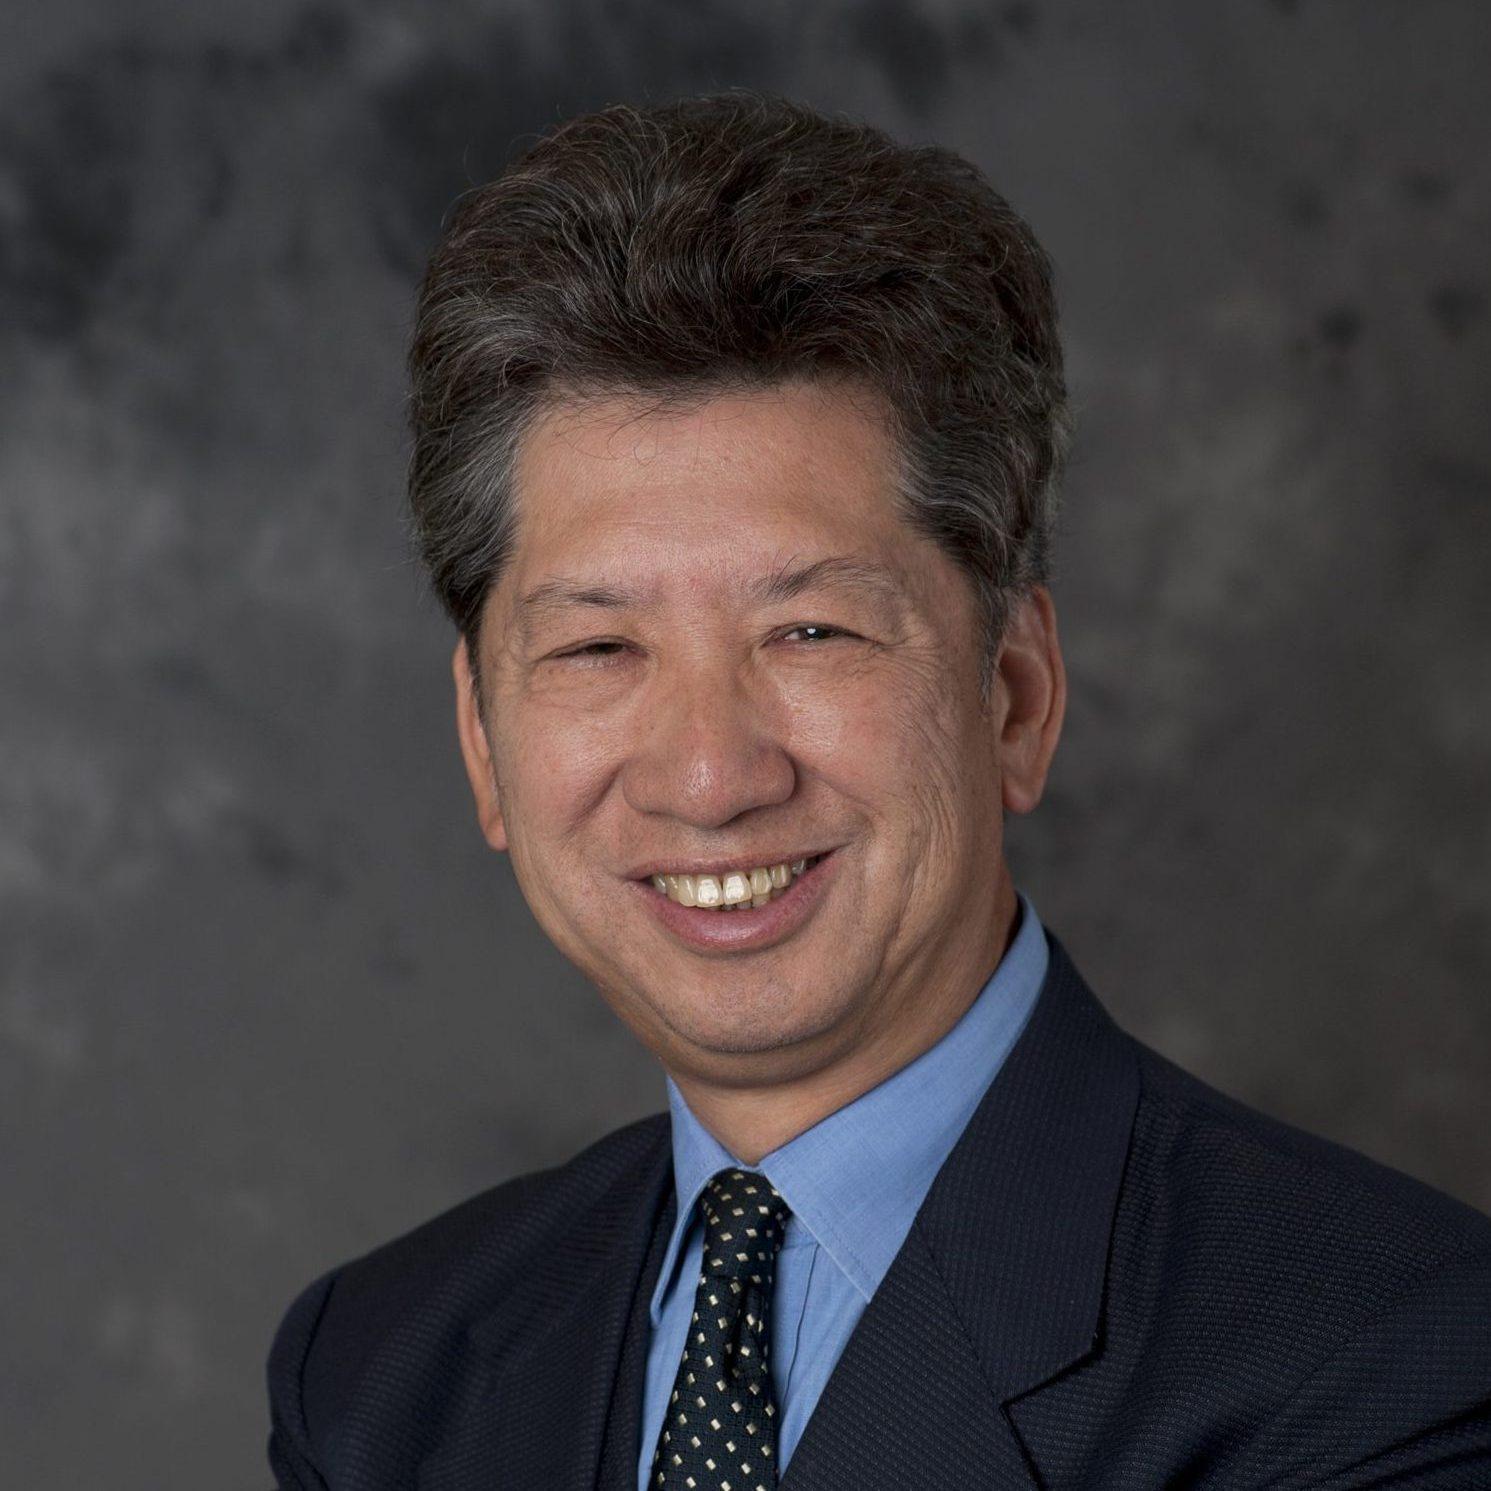 http://pathofdemocracy.hk/wp-content/uploads/2017/07/-e1499402467946.jpg